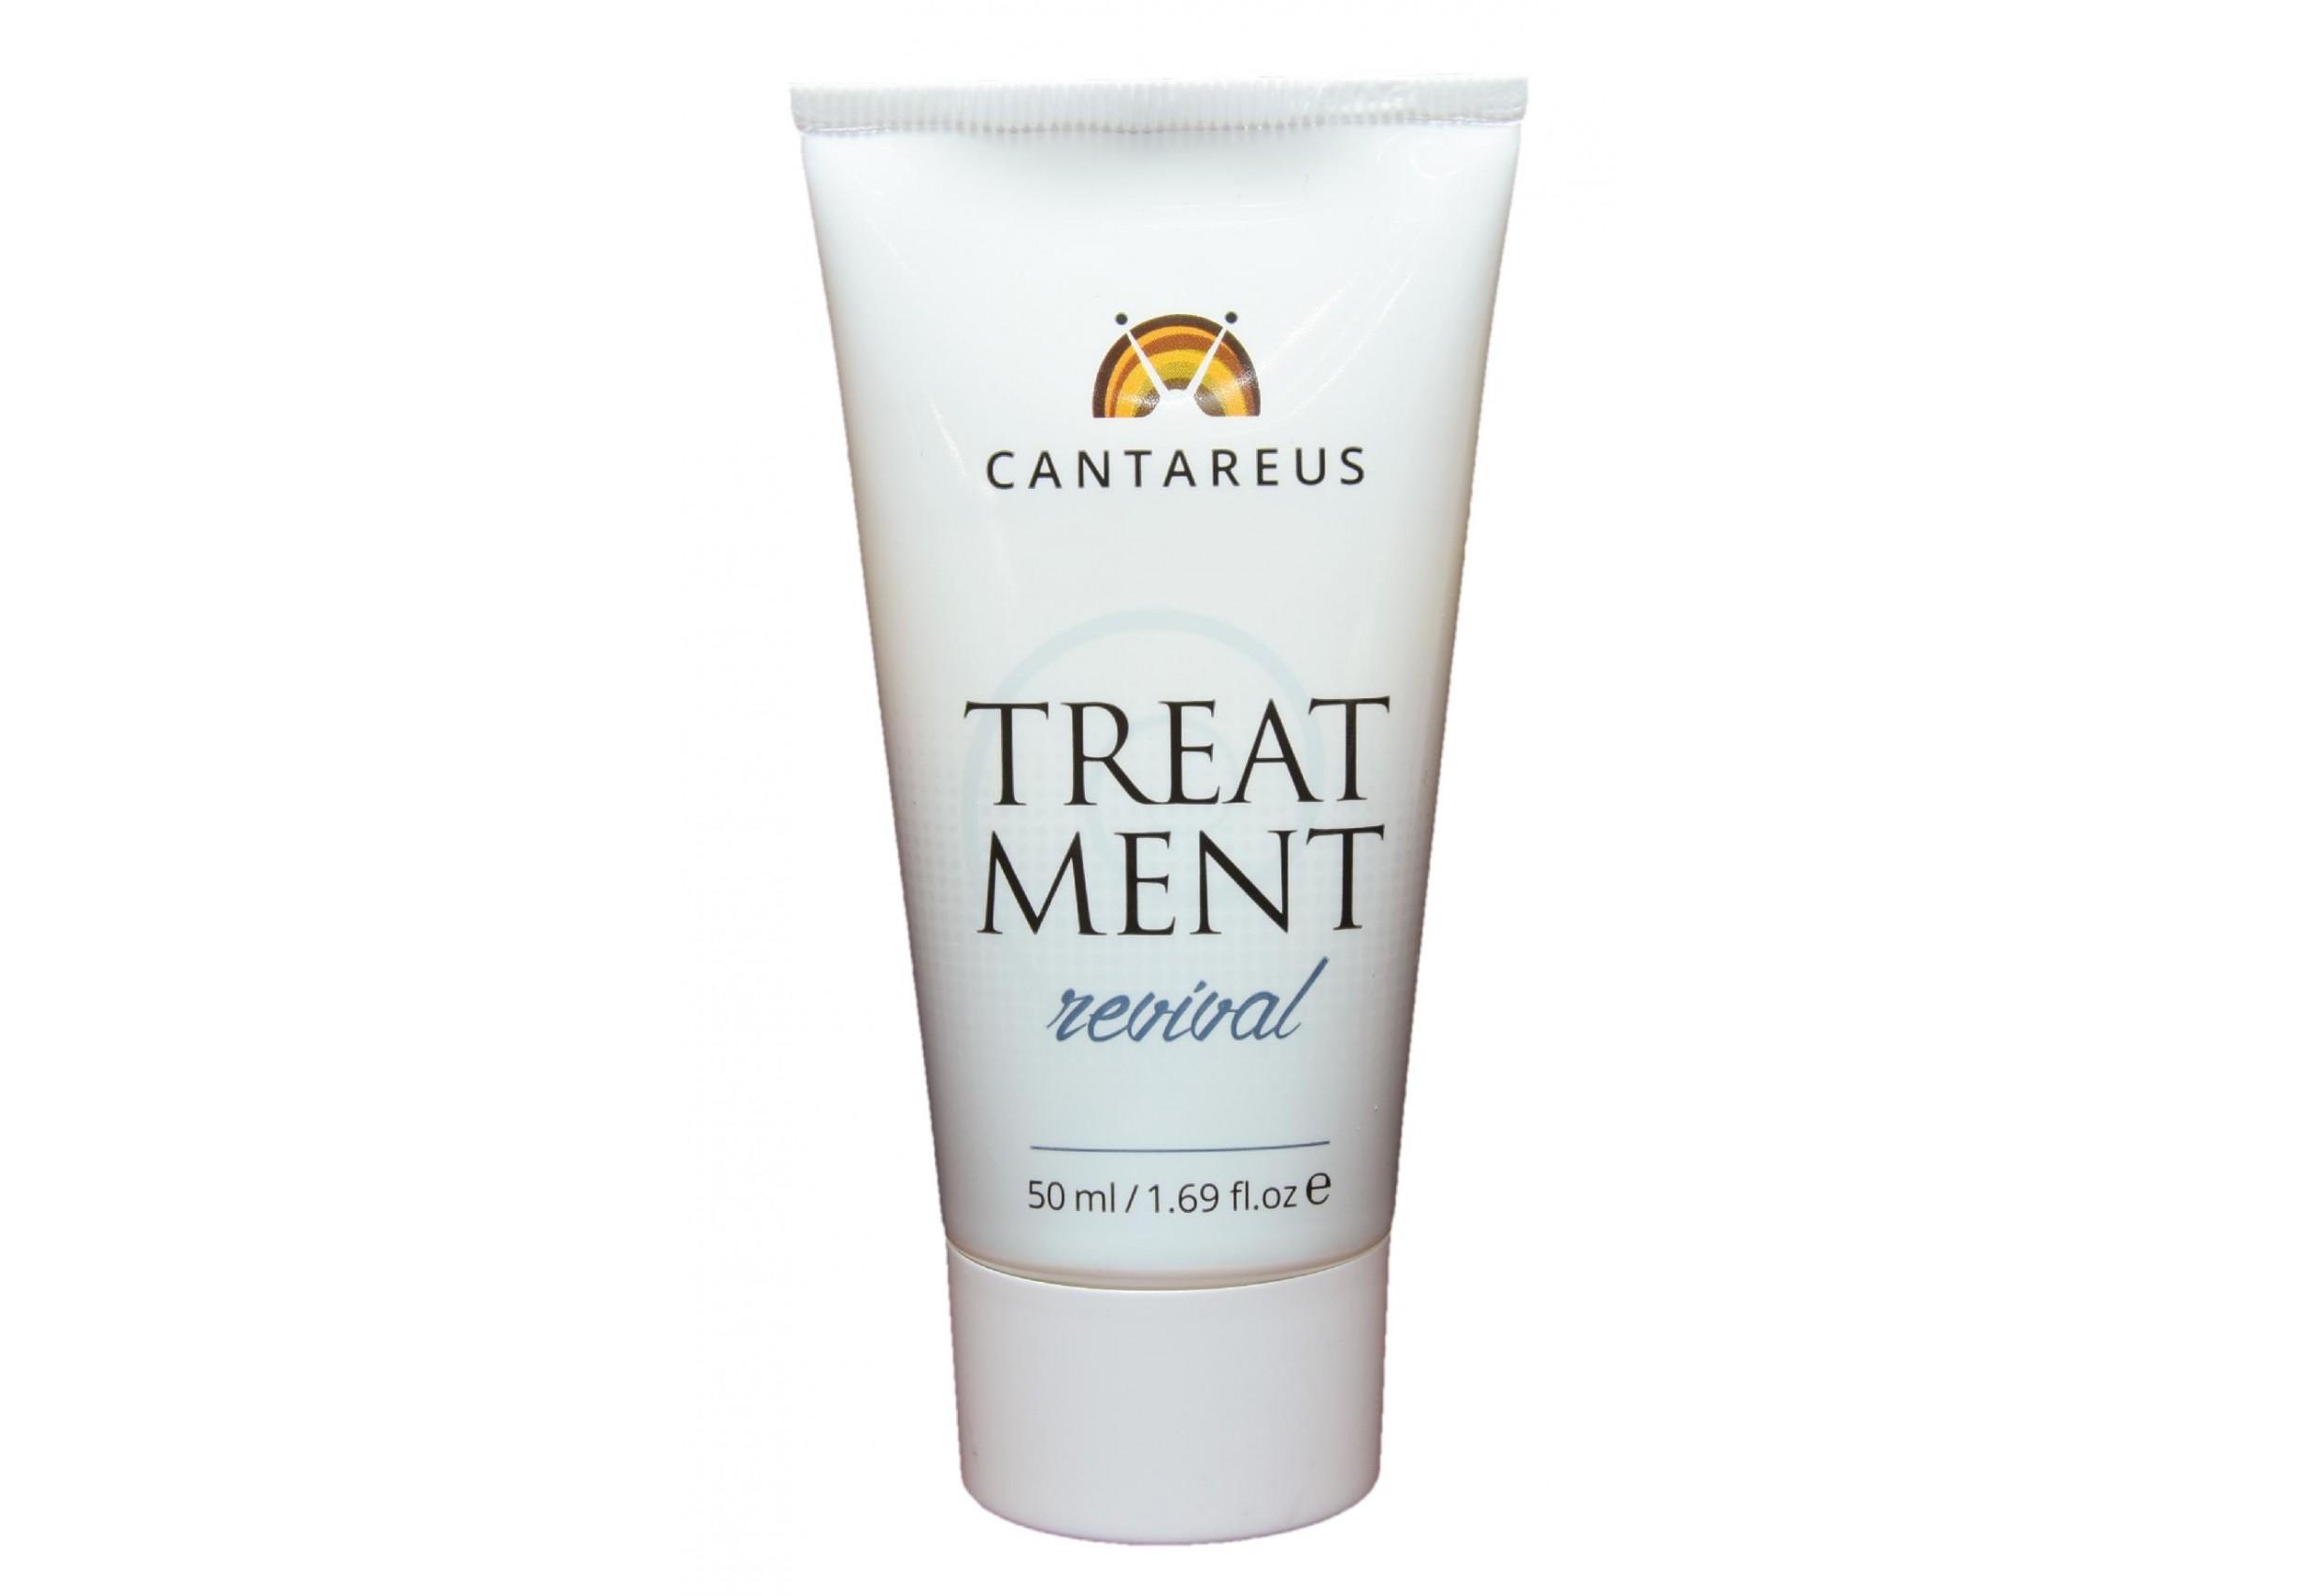 CANTAREUS REVIVAL TREATMENT - joints ointment